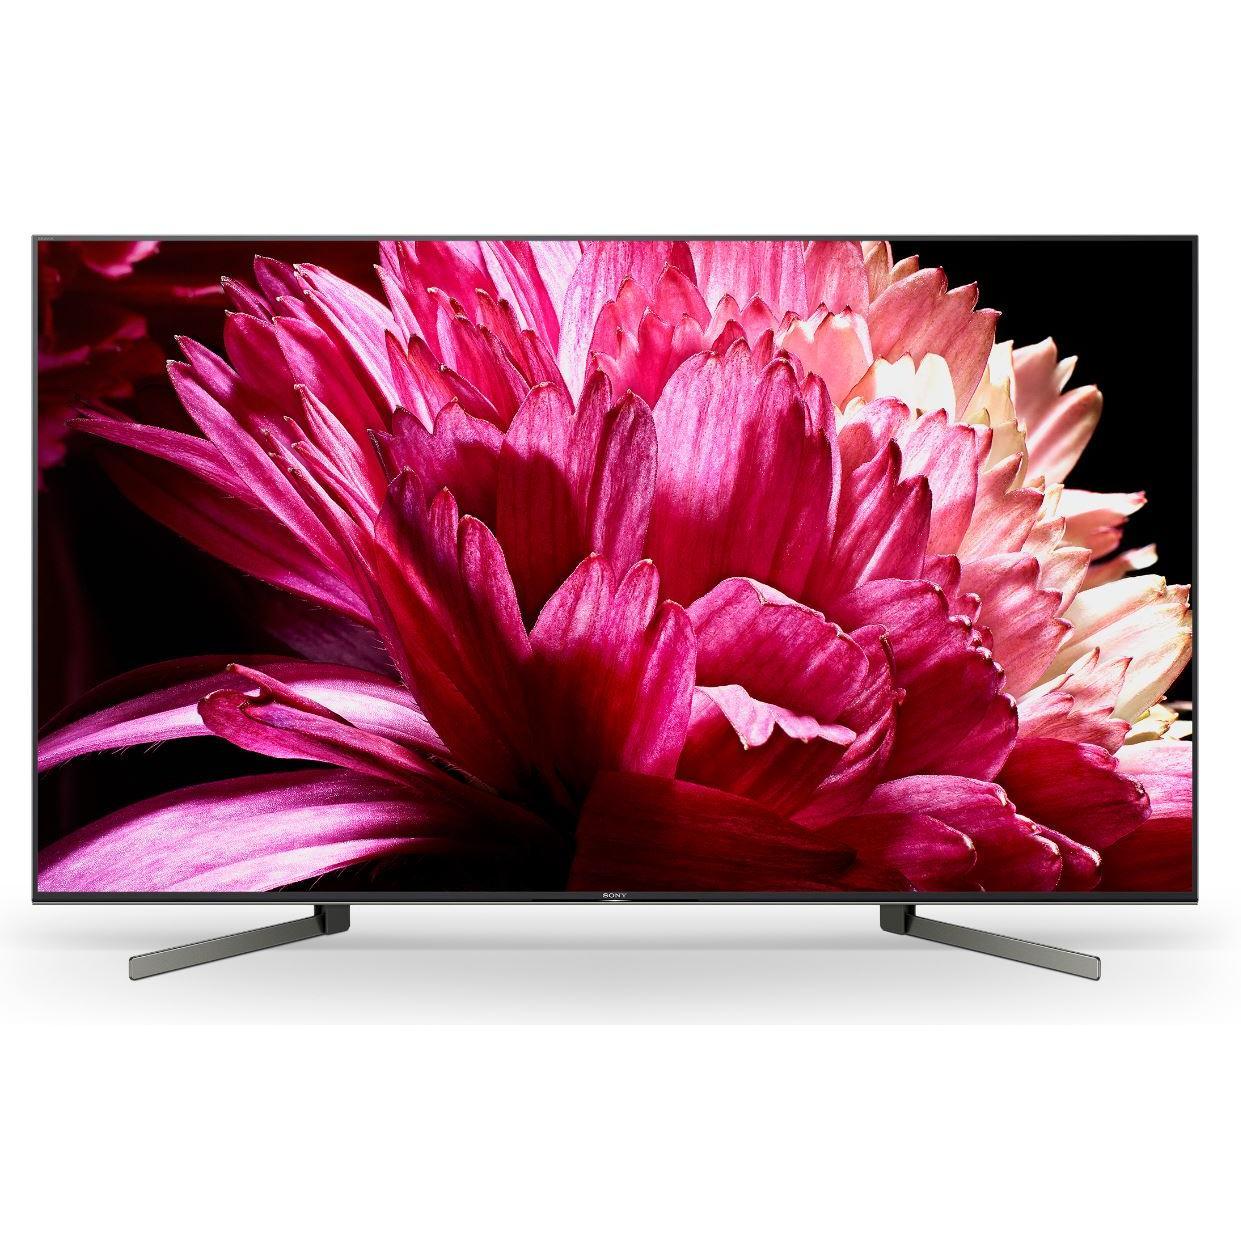 "Sony KD-55XG9505 55"" LED 4K Ultra HD HDR Smart Television"